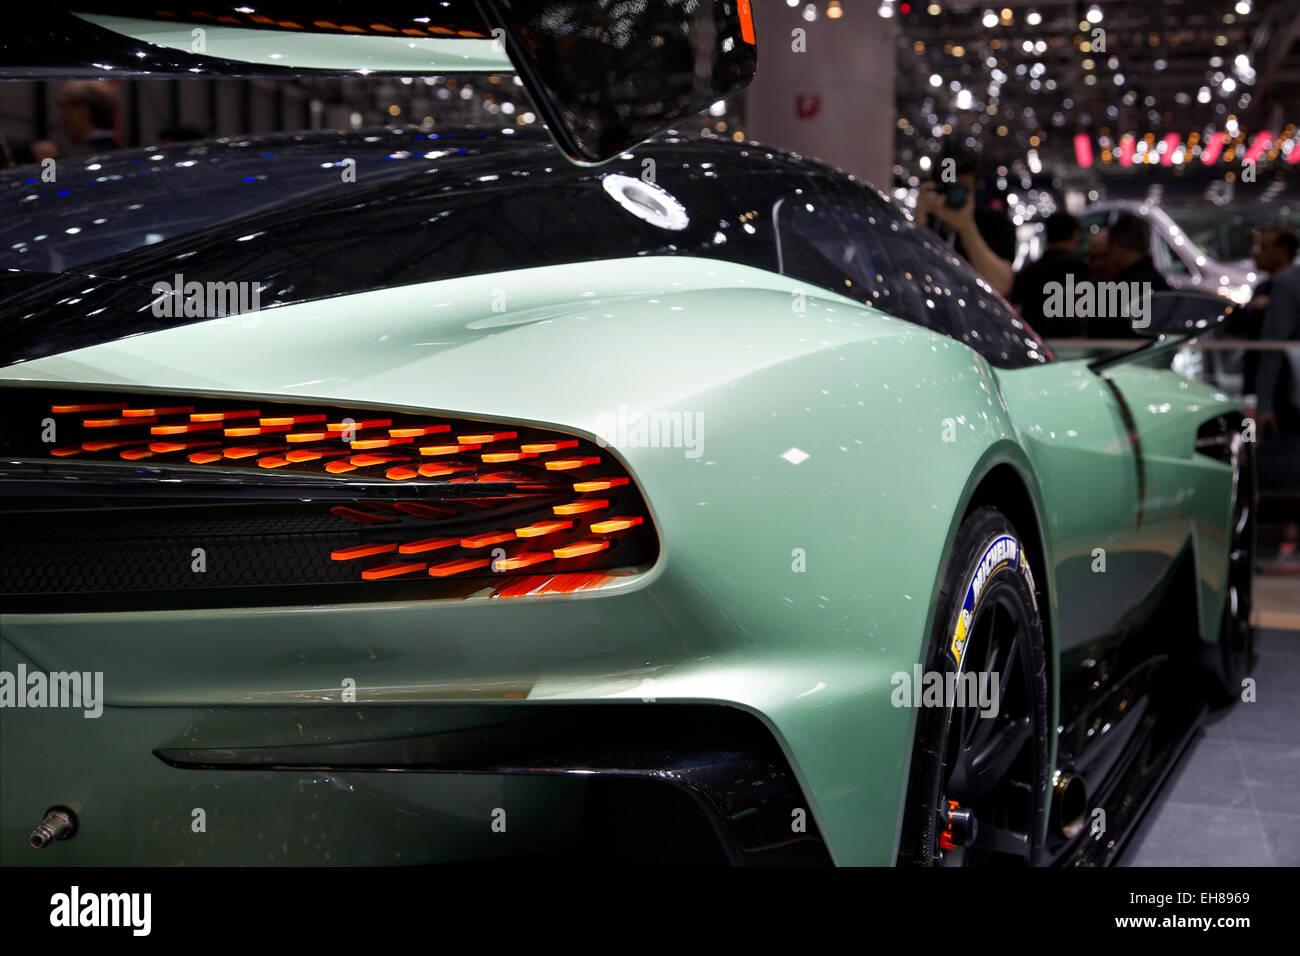 Aston Martin Vulcan Shown At The Geneva Motor Show 2015 Stock Photo Alamy